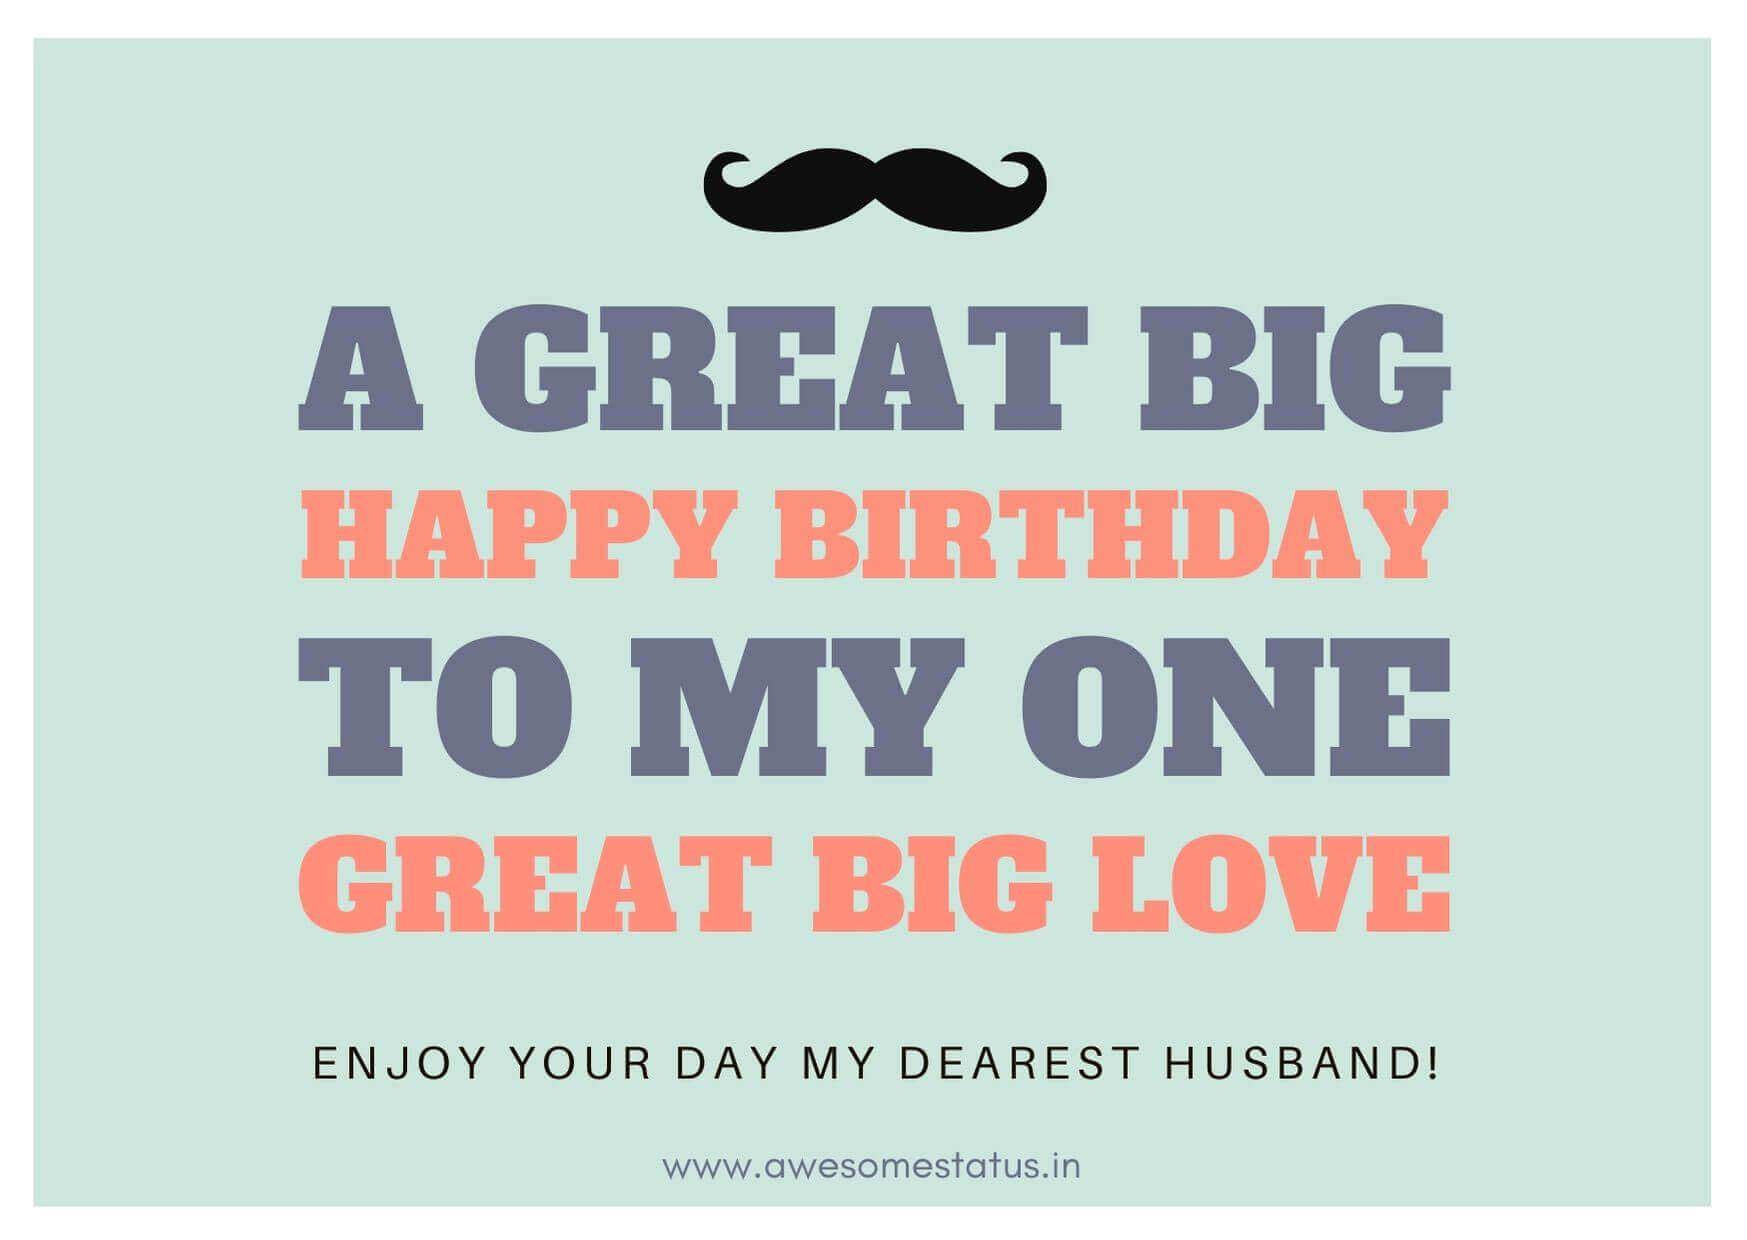 Husband's birthday